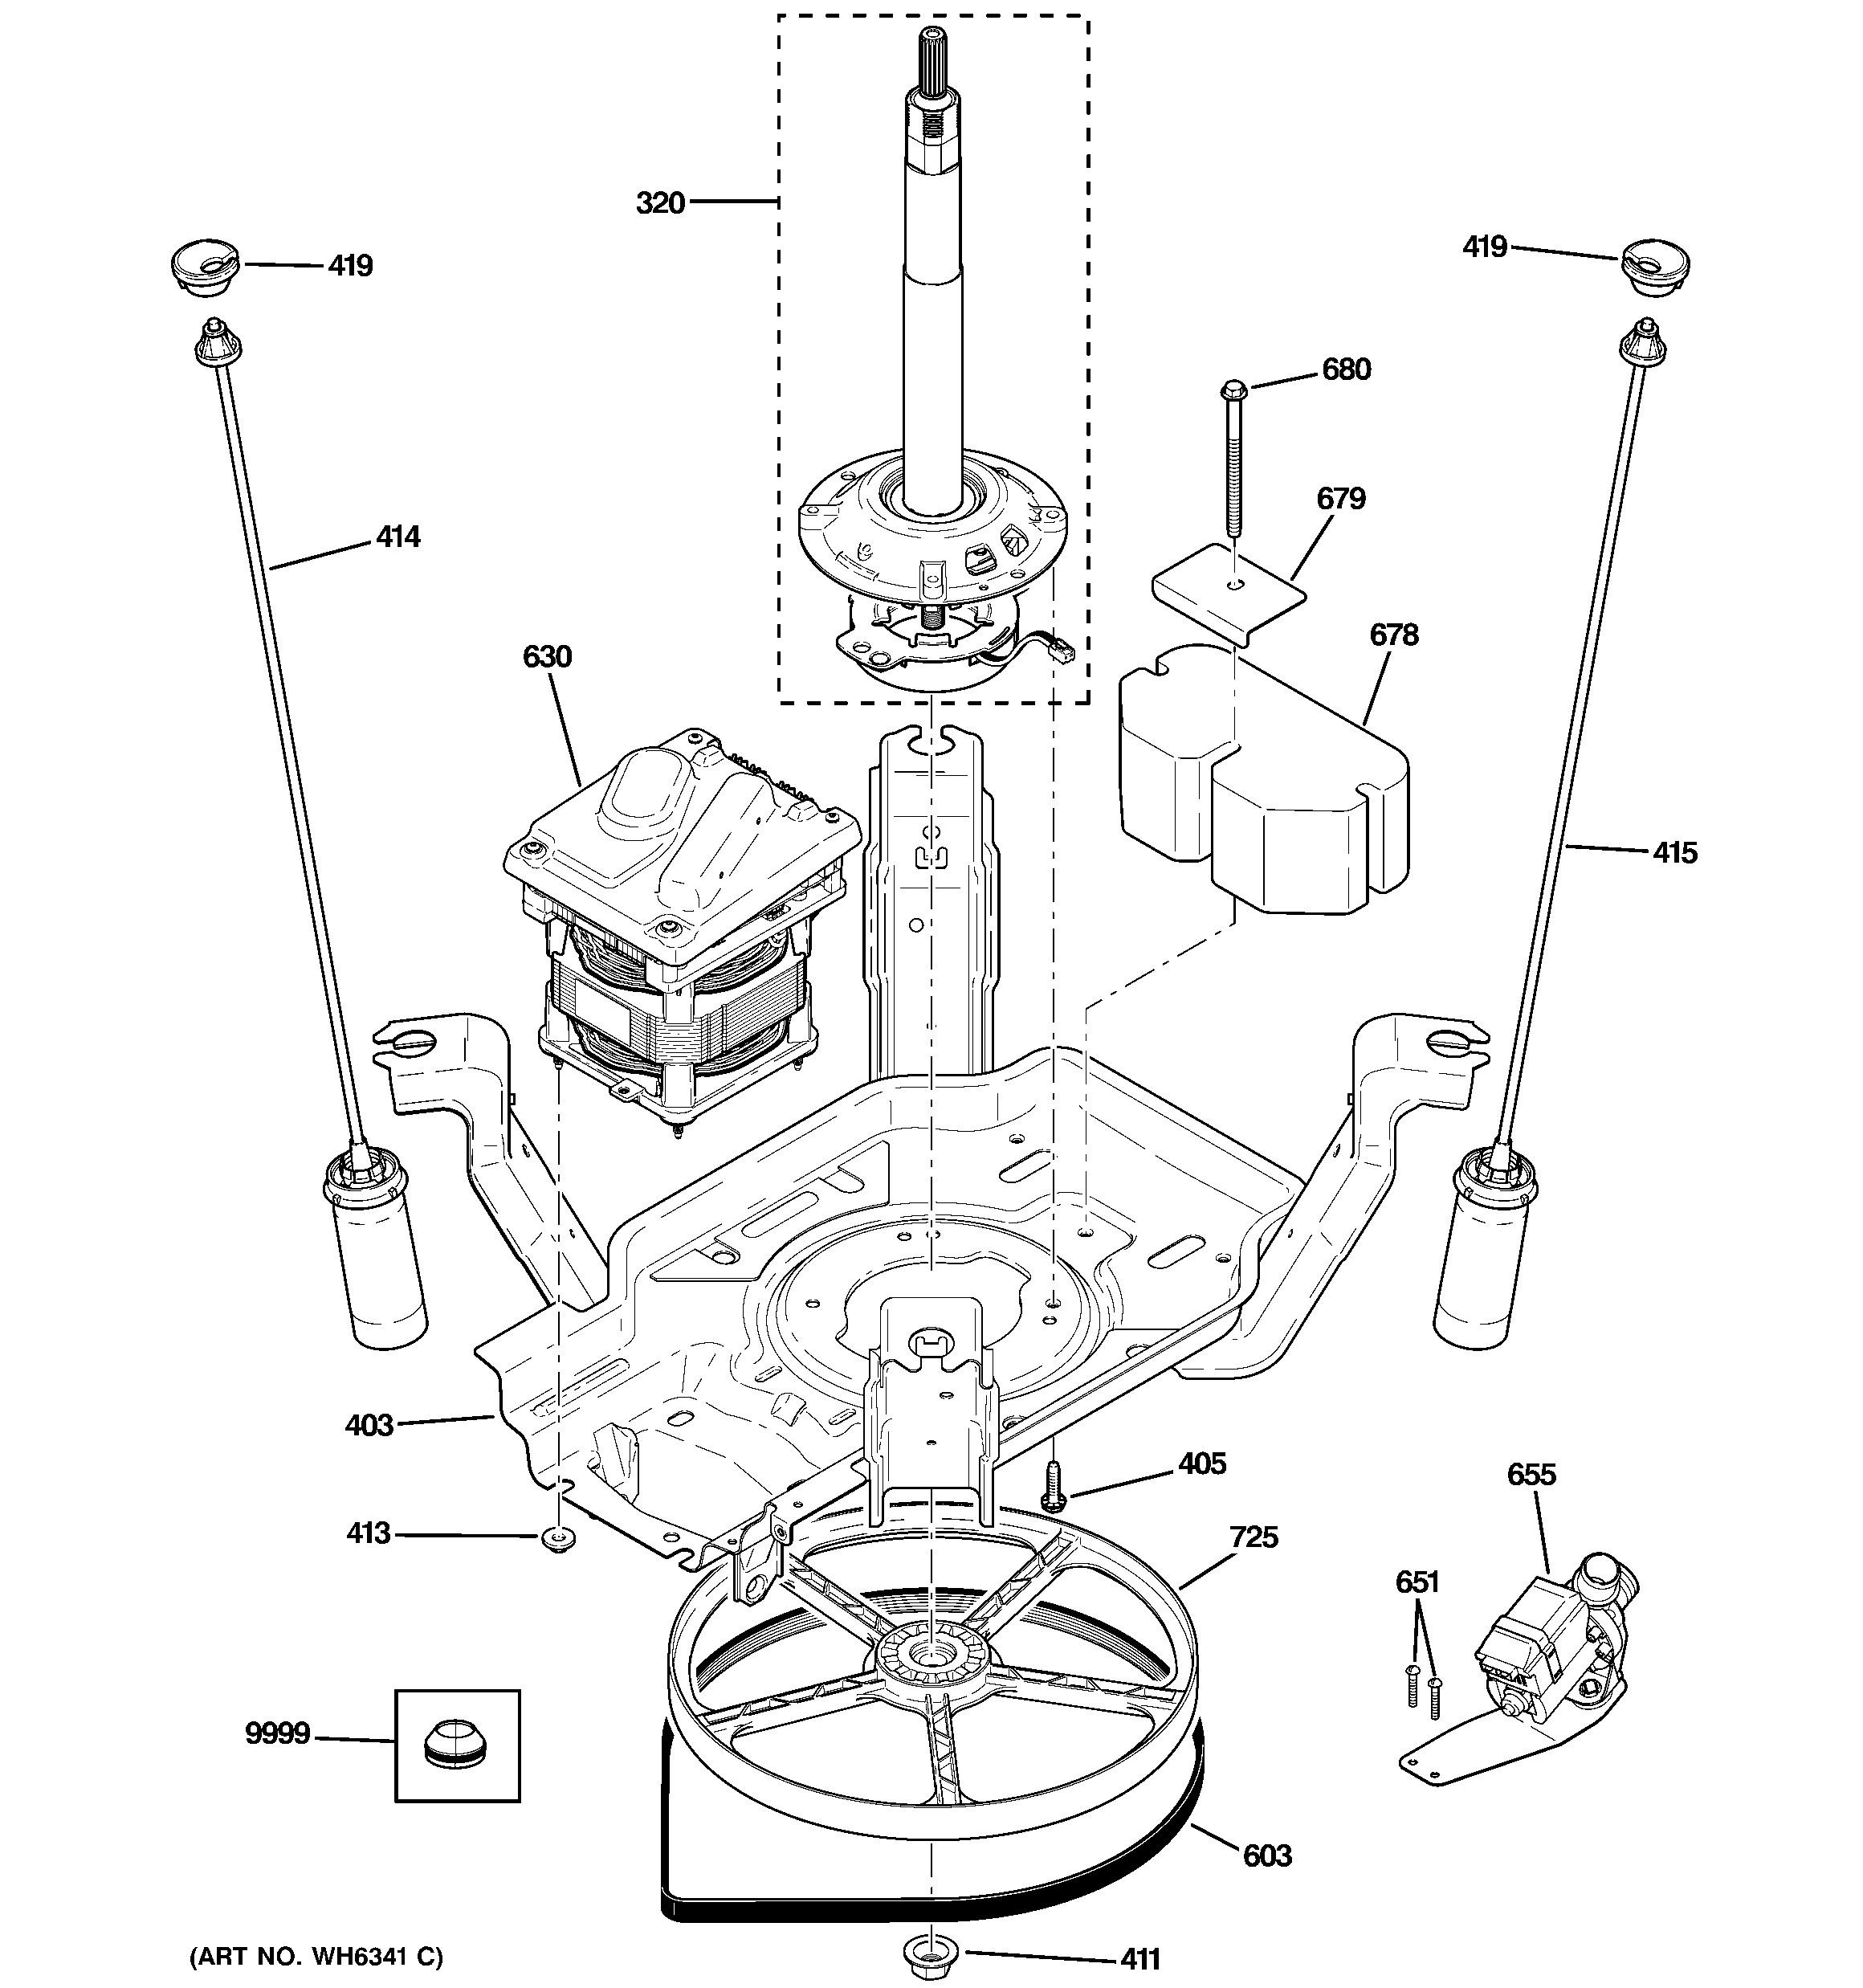 Engine Parts Diagram Names Ge Washer Parts Model Wjre5500g0ww Of Engine Parts Diagram Names